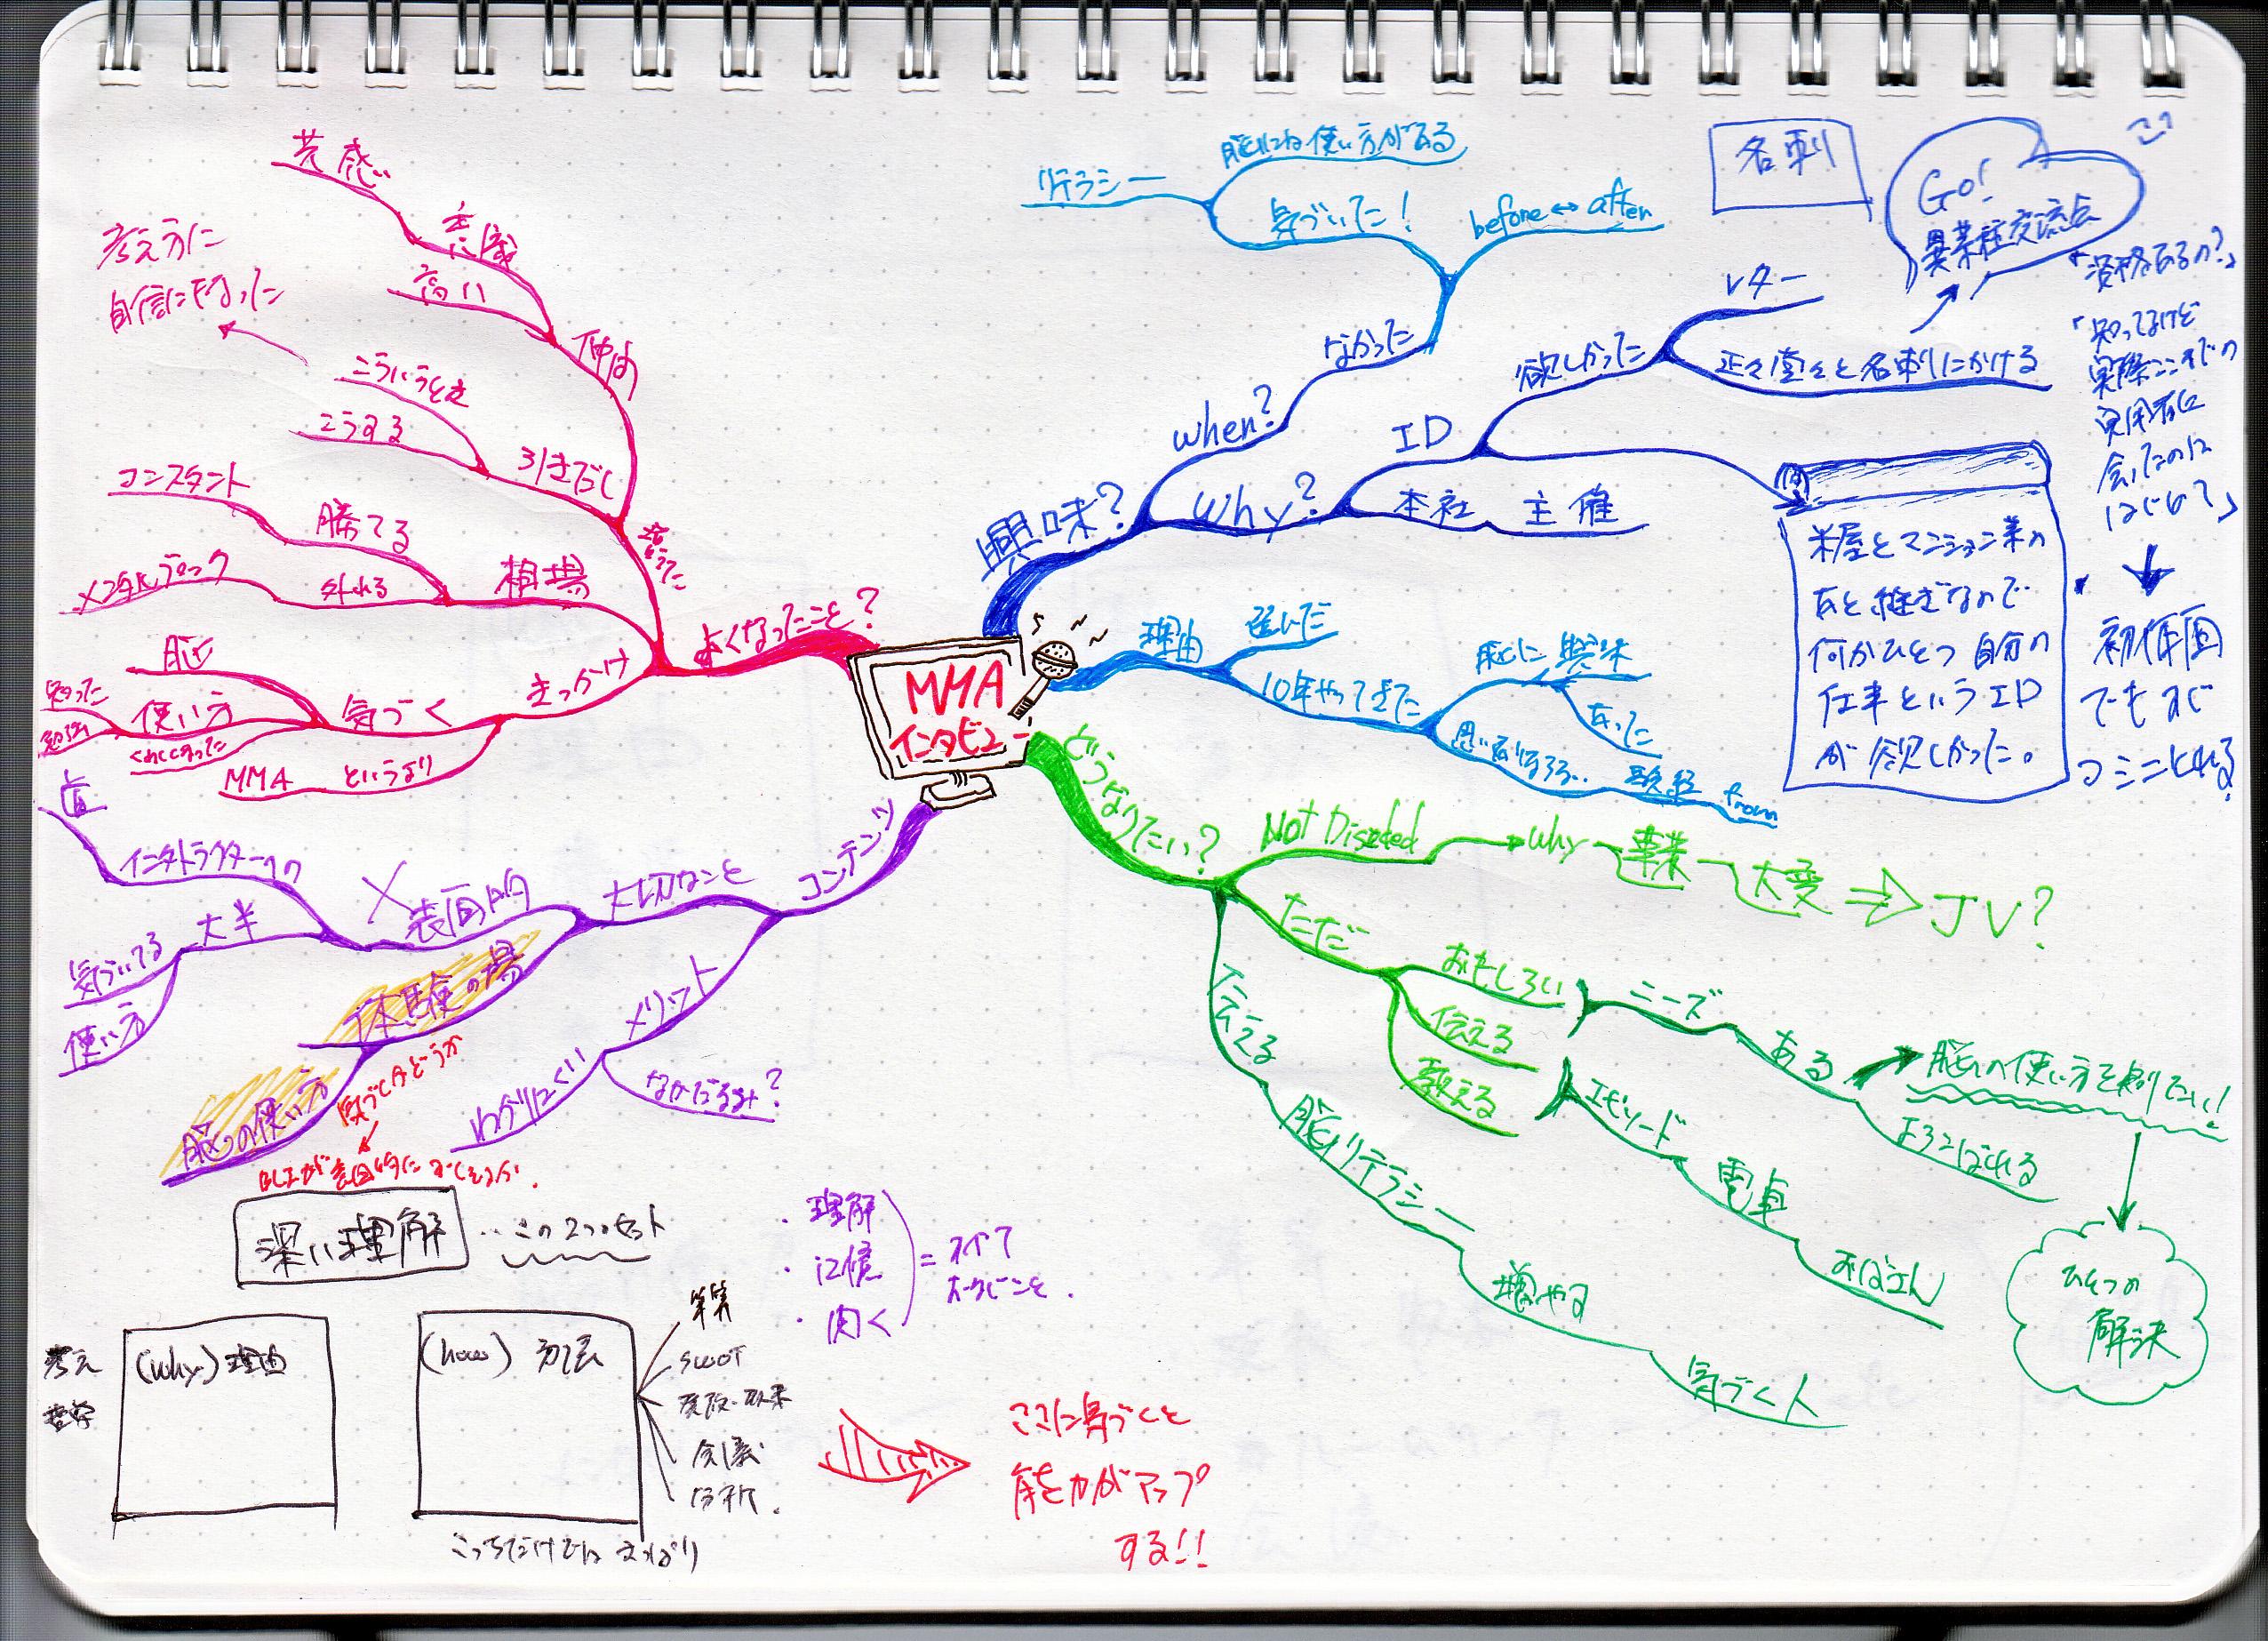 http://mindmap.jp/yamamotoyasuji_interview.jpg